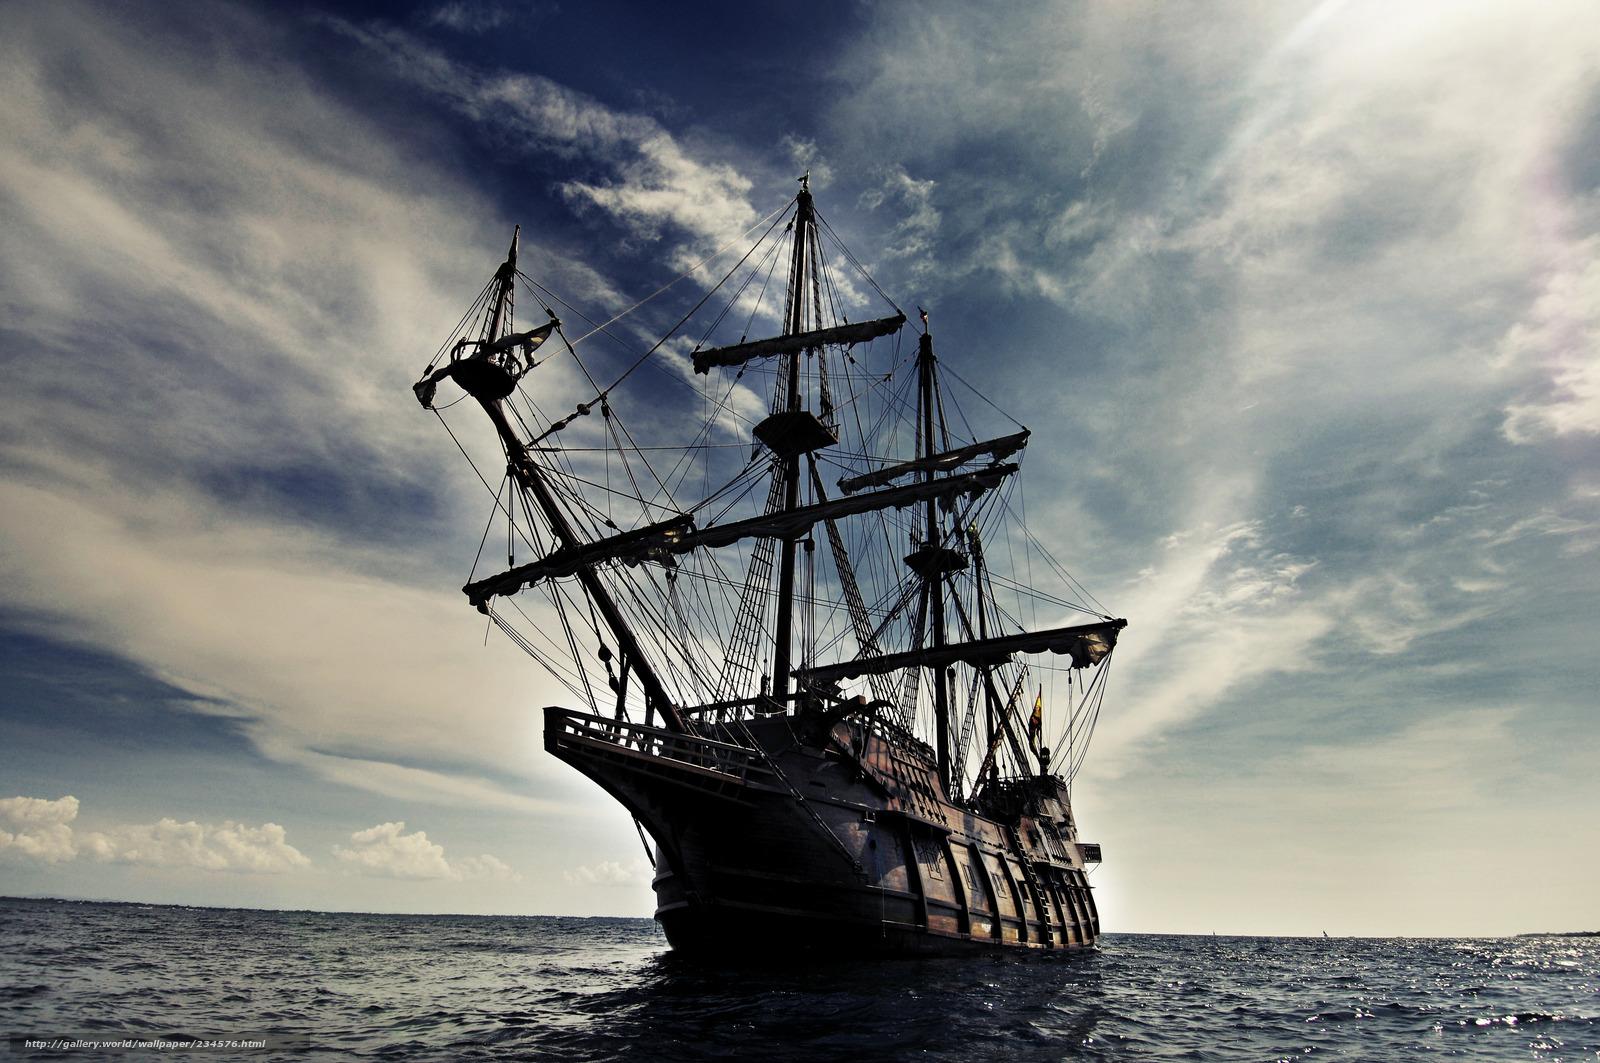 Sailing Ship on Stormy Sea Full HD Fond décran and Arrièreplan